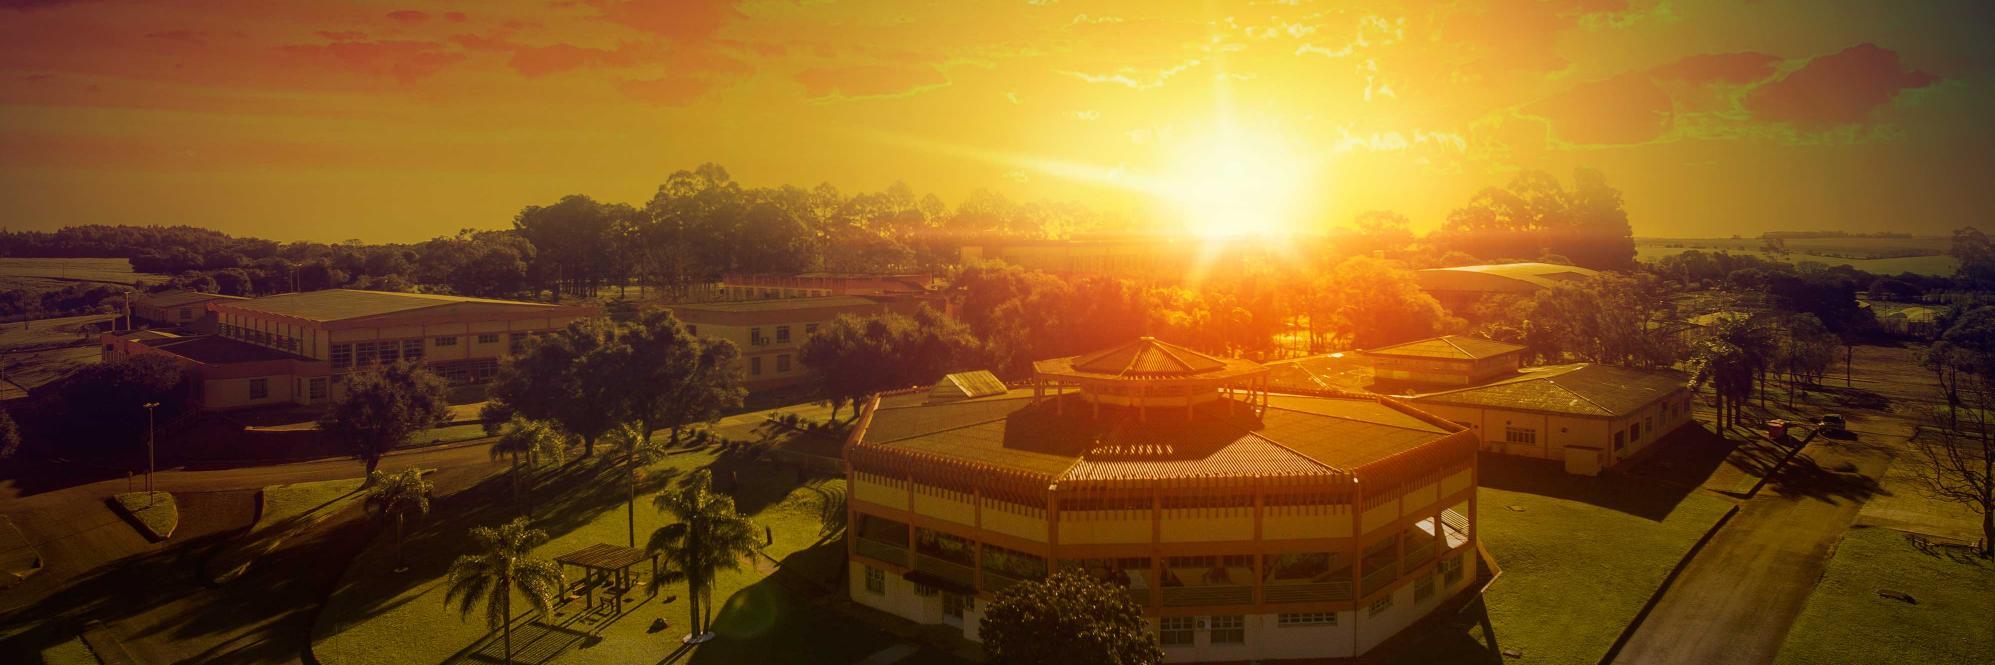 Universidade de Cruz Alta's official Twitter account